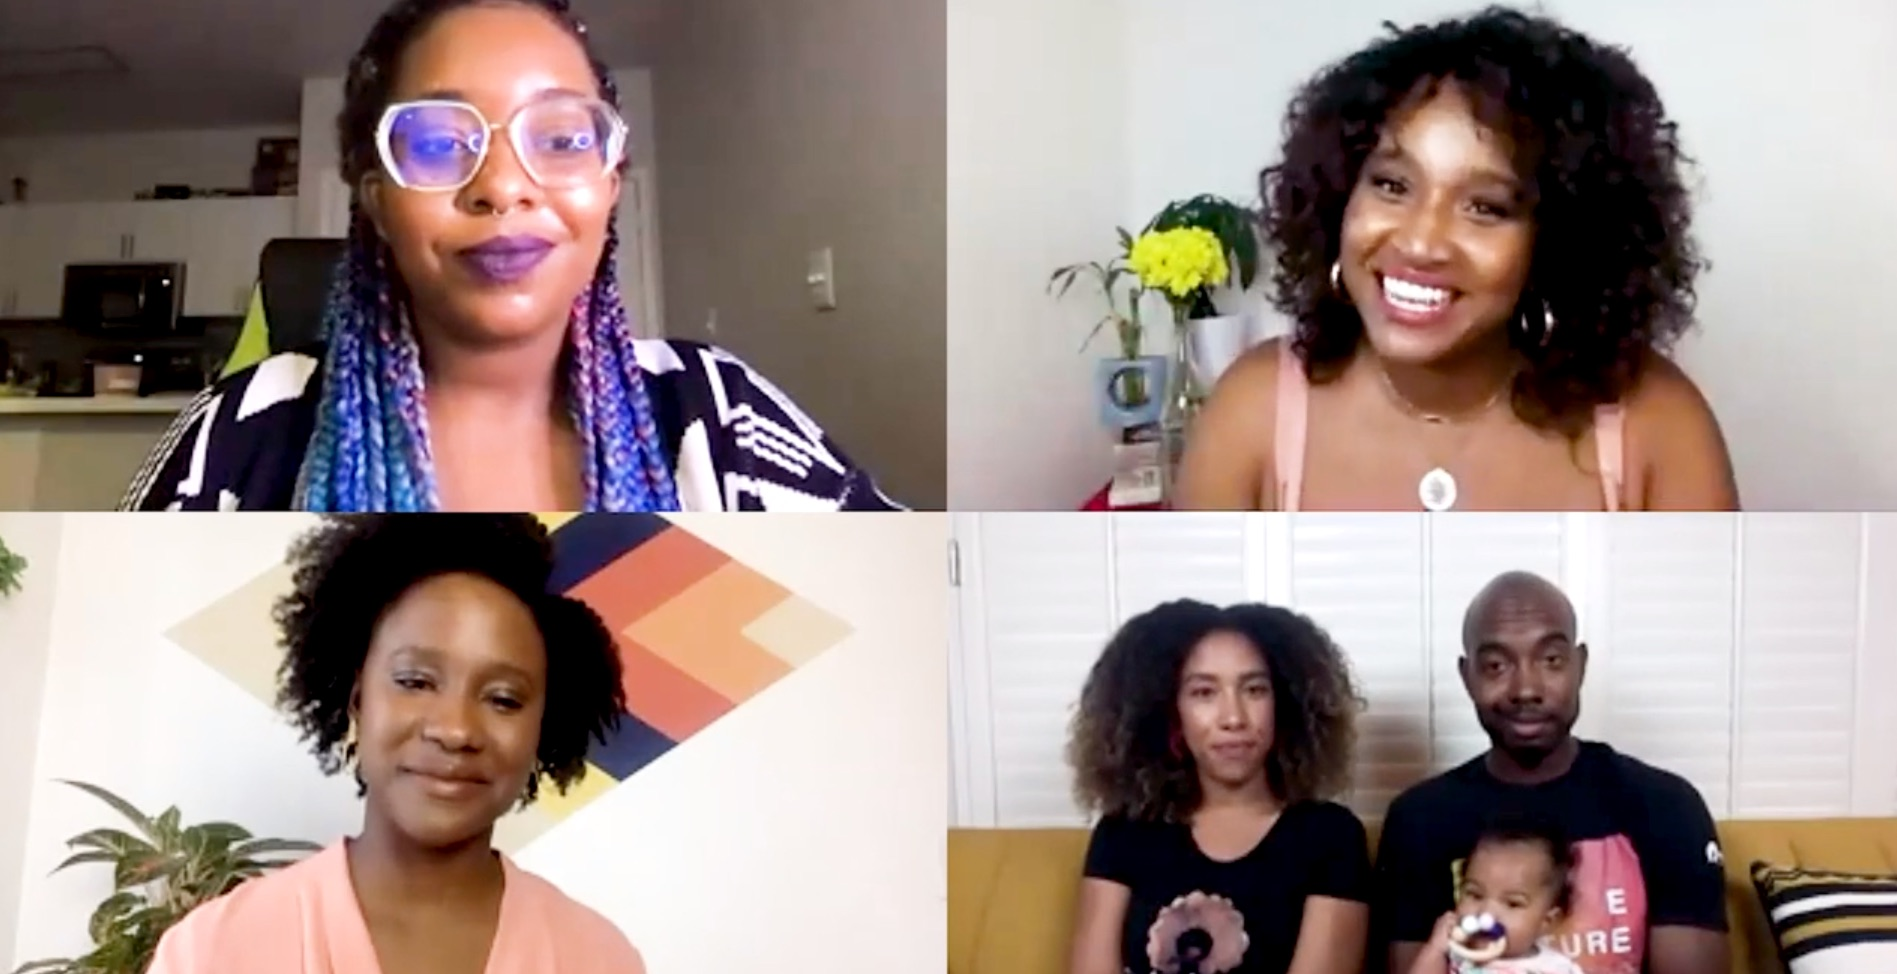 GoDaddy Black Lives Matter Roundtable